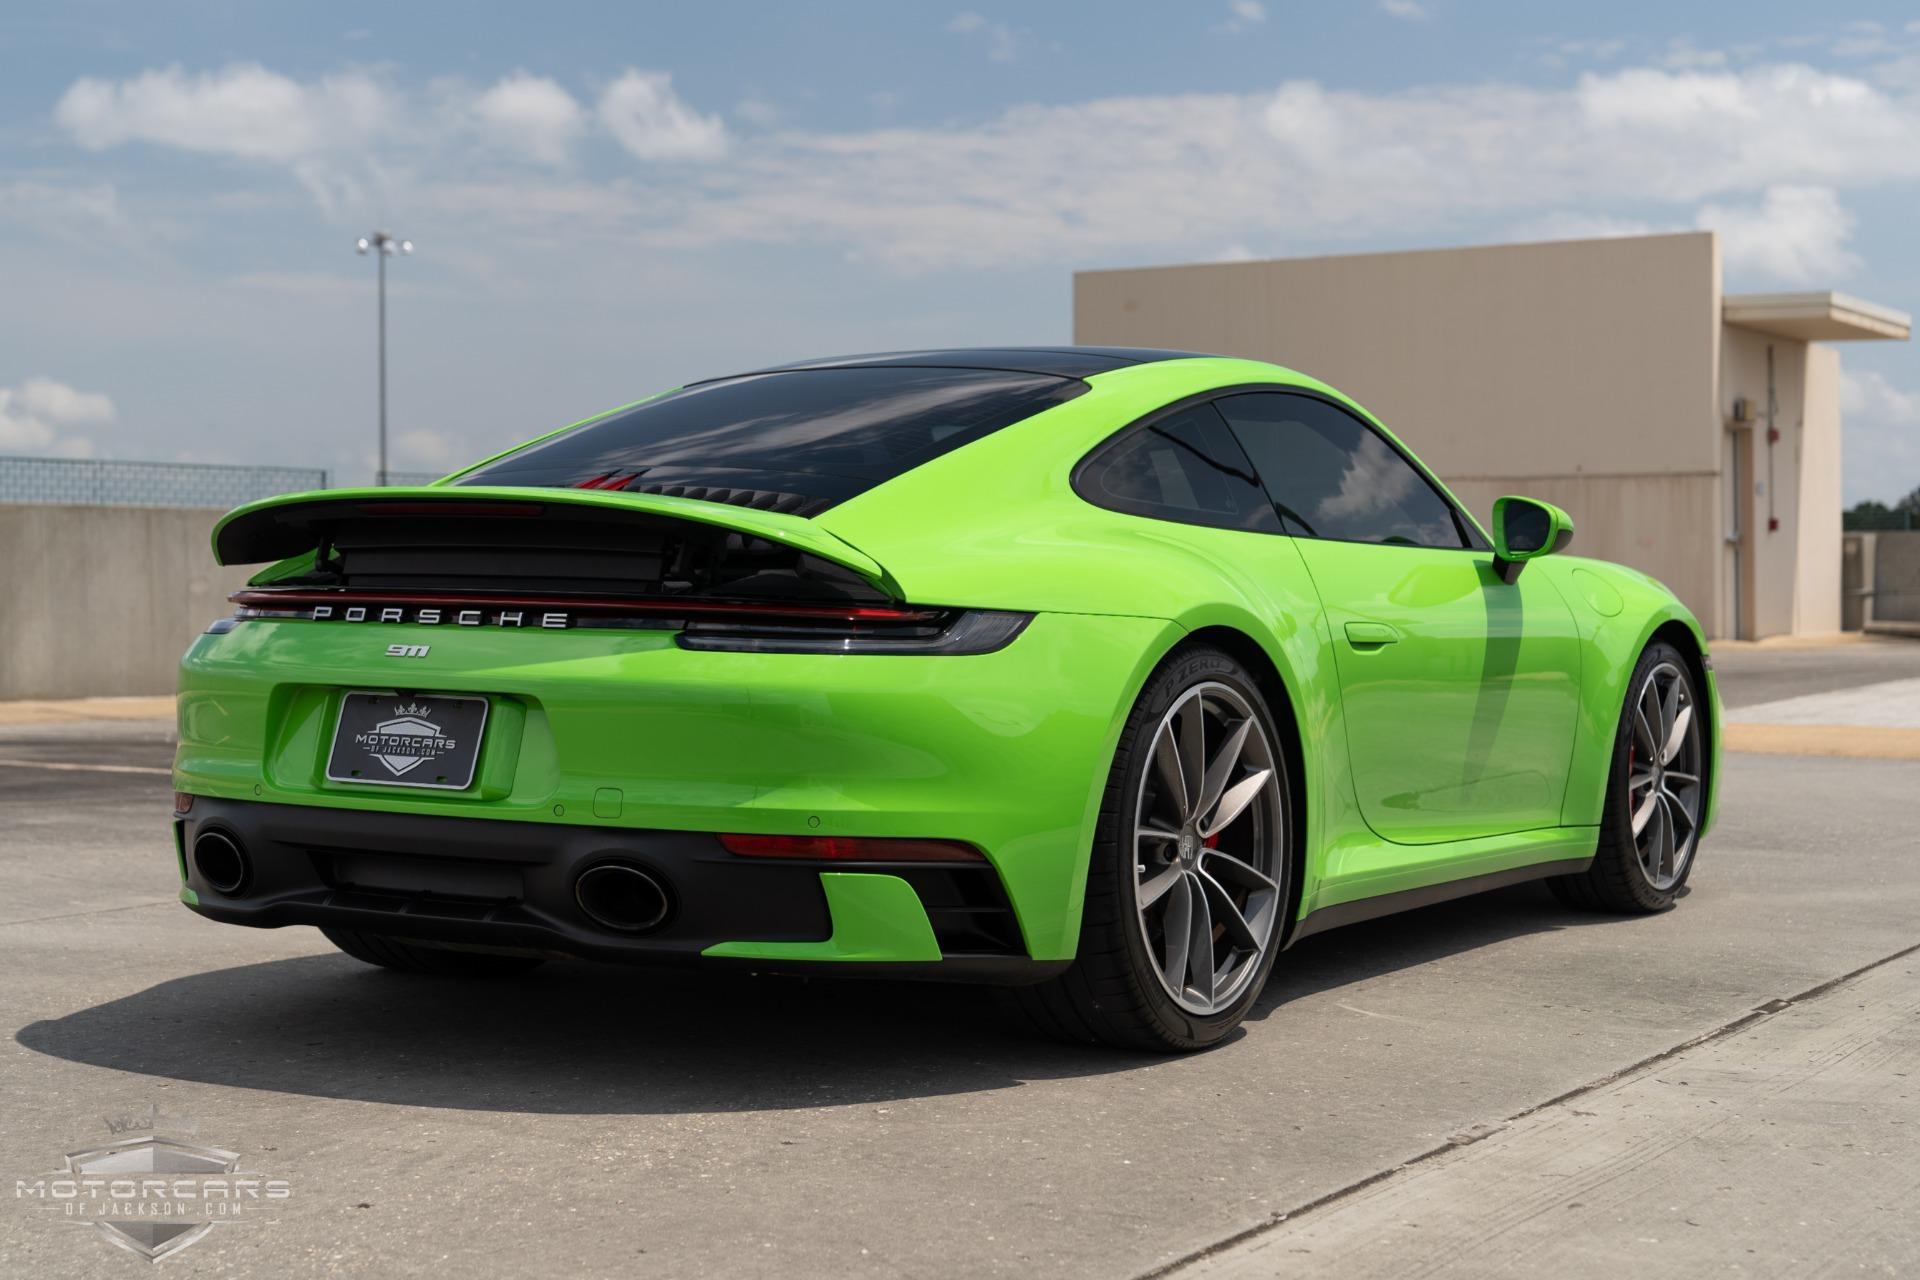 Used-2020-Porsche-911-Carrera-S-Jackson-MS